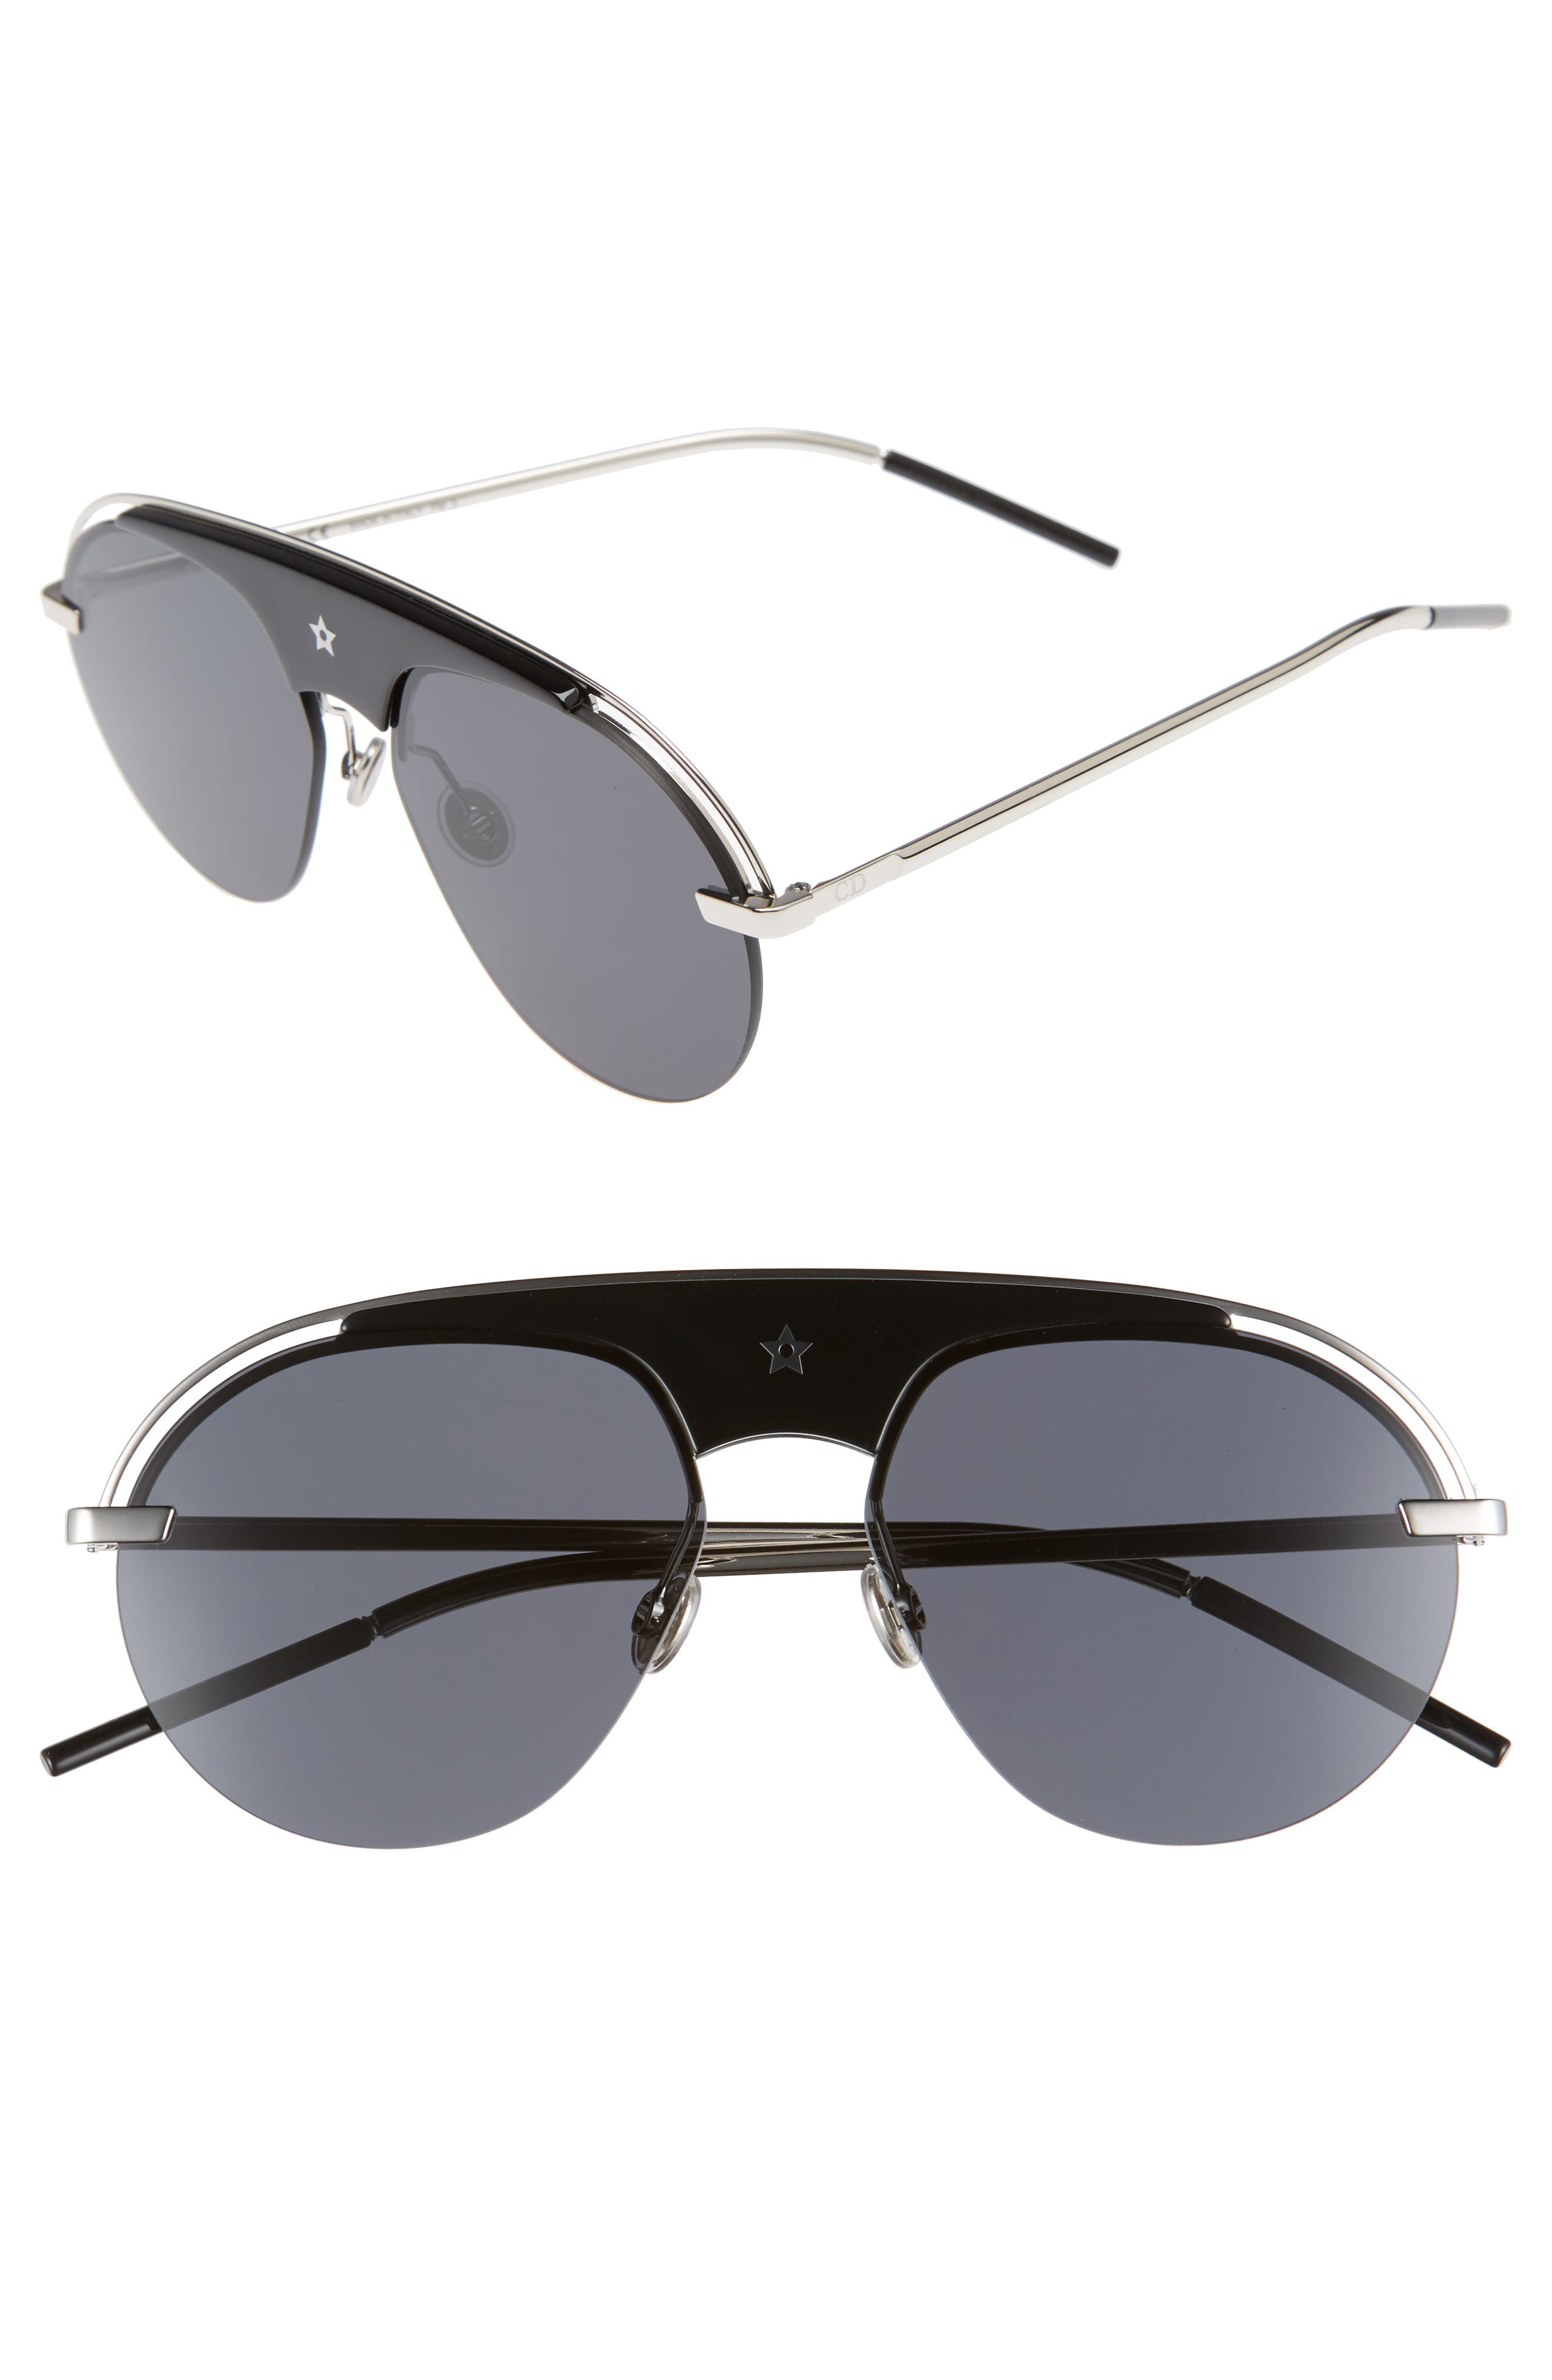 Dior Revolution 58mm Aviator Sunglasses